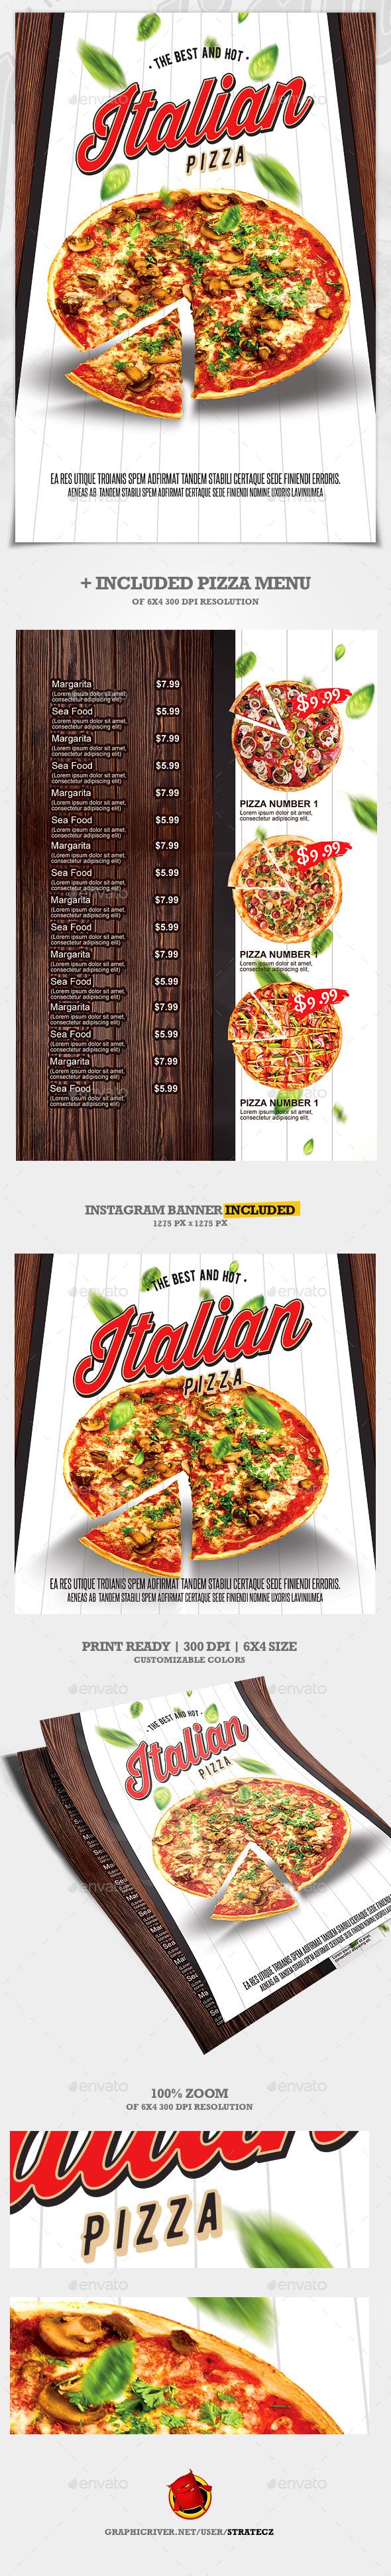 Pizza Flyer + Pizza Menu - Print Templates